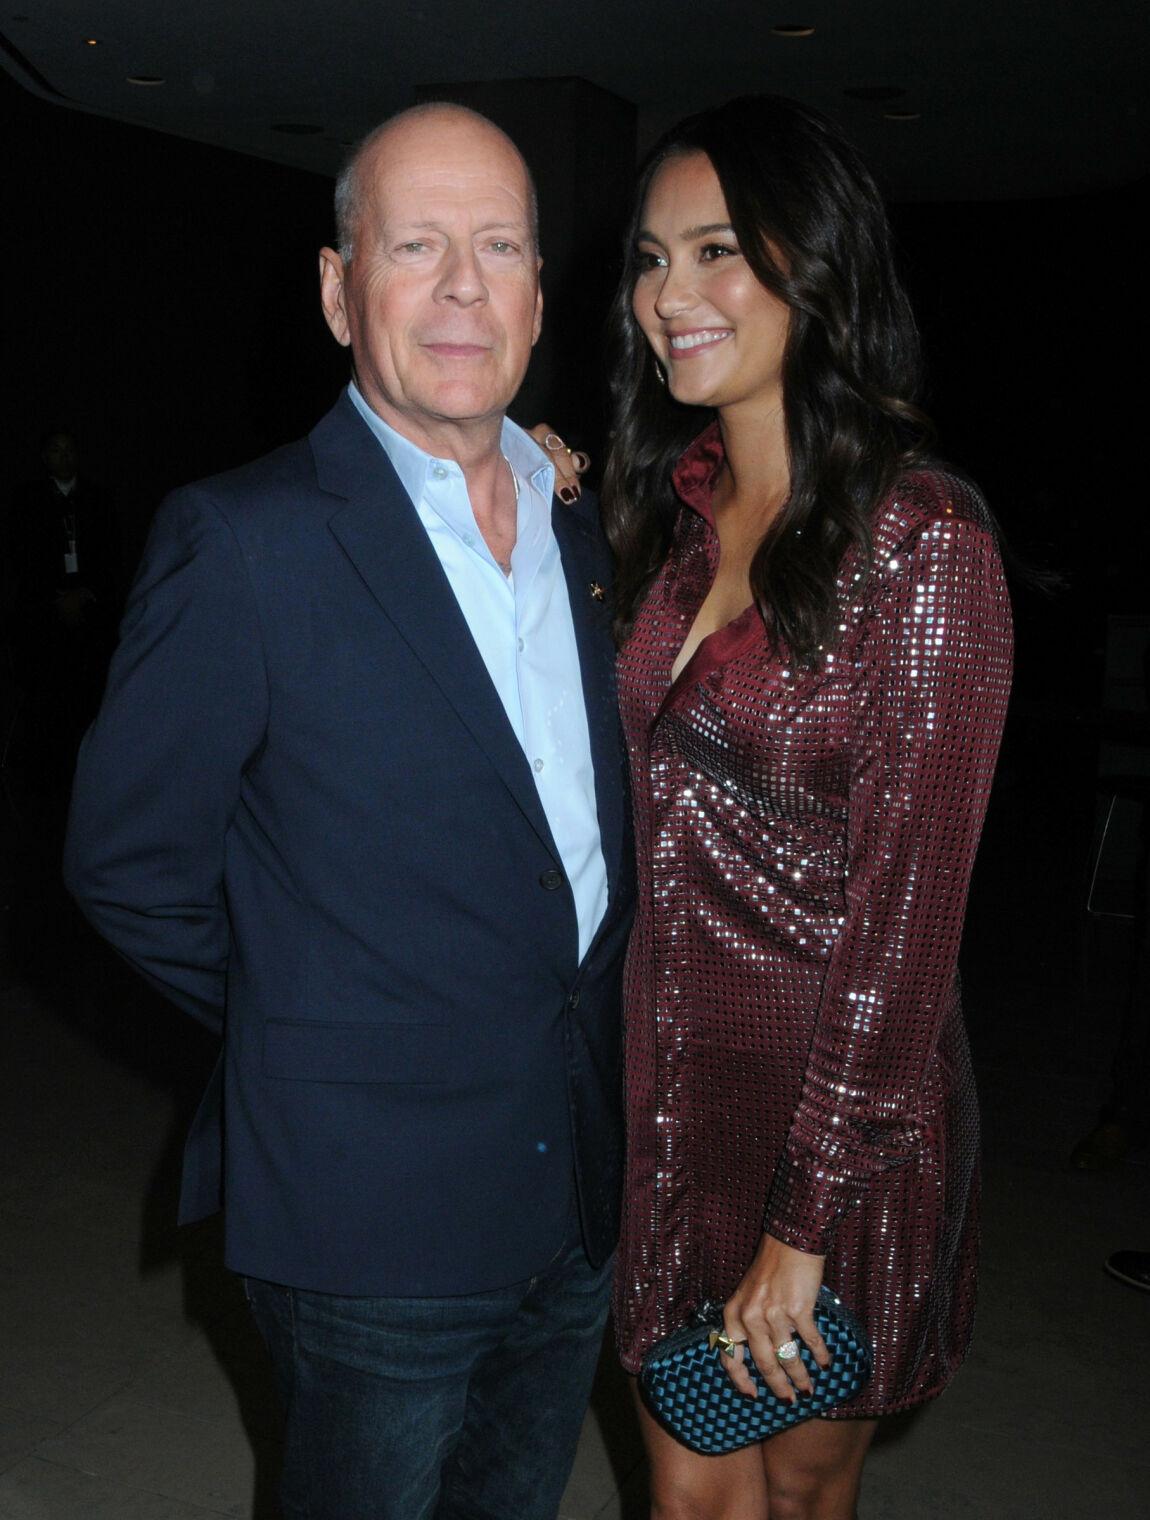 NY KONE: Bruce Willis med kona Emma Heming i New York i fjor. Foto: NTB Scanpix